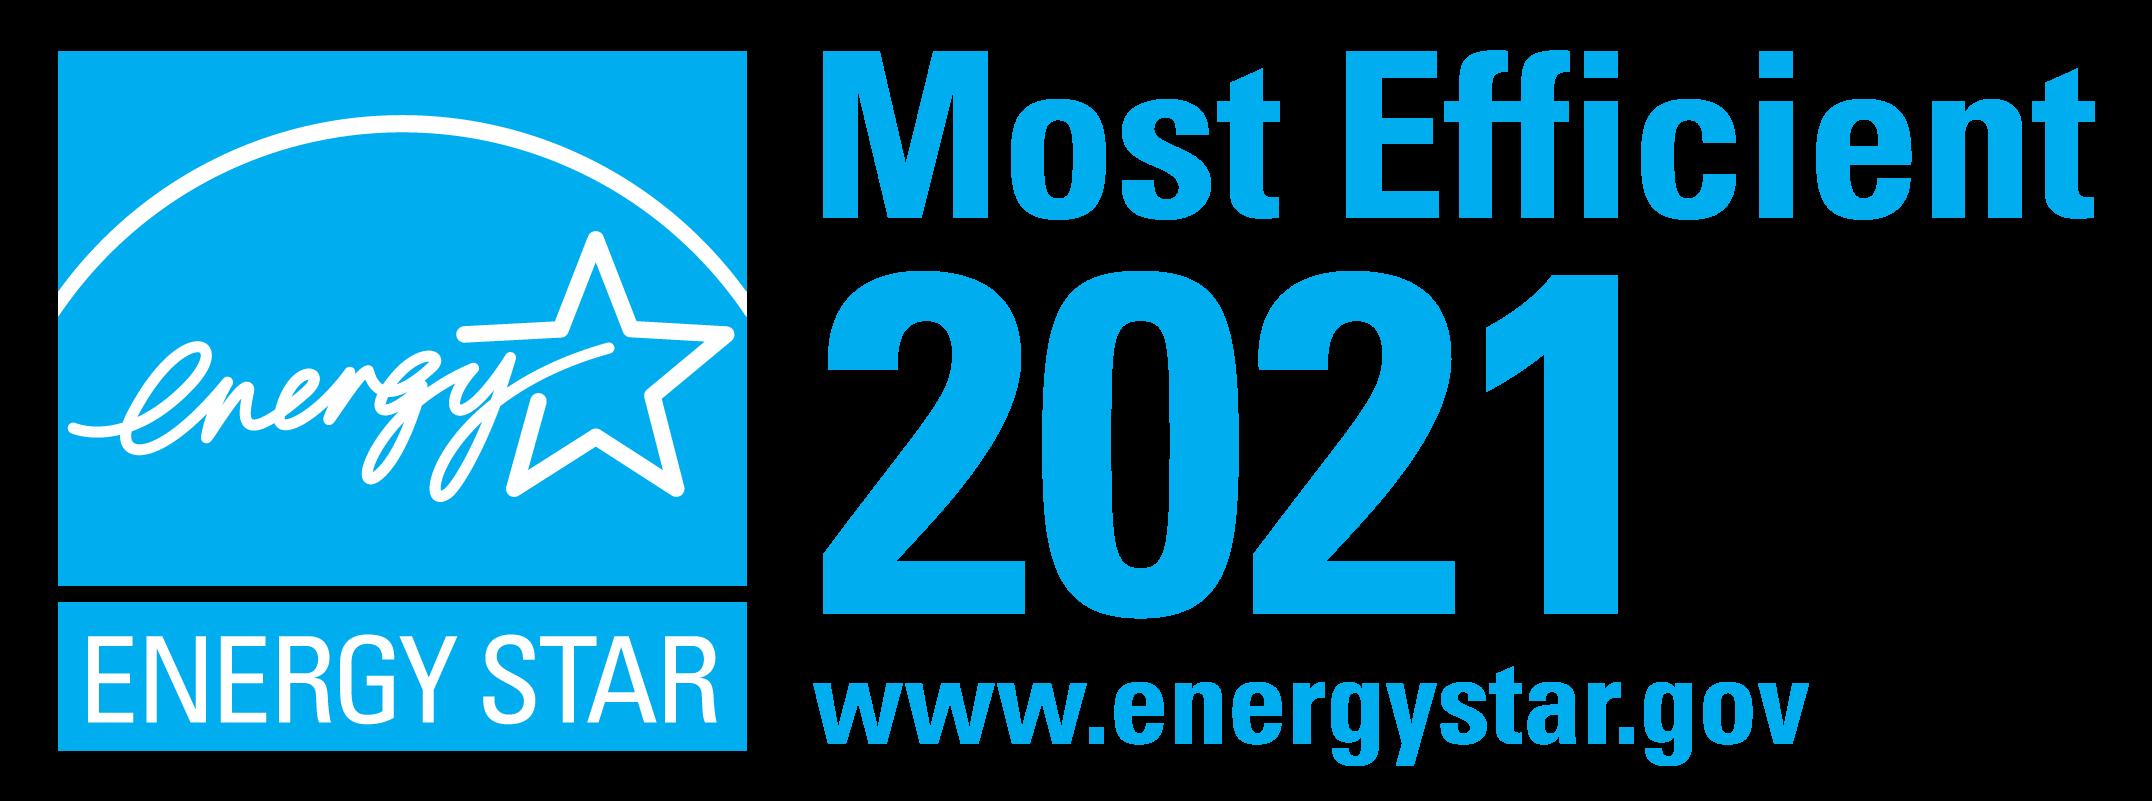 Most Efficient 2021